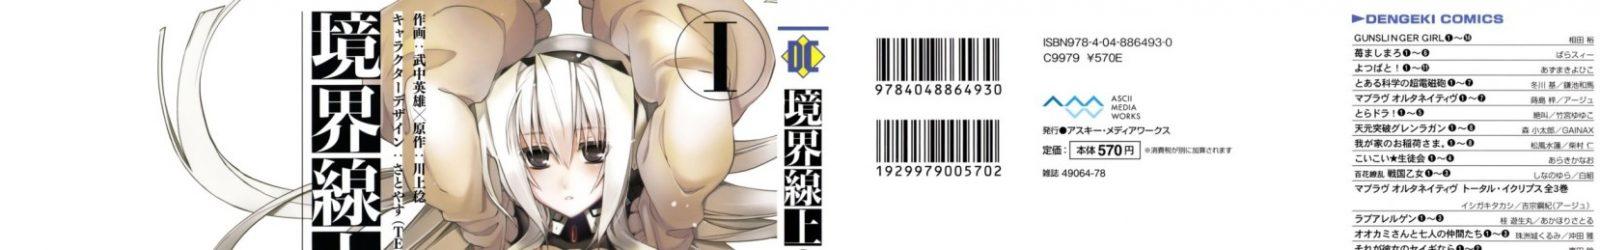 Kyoukai Senjou no Horizon [Manga] [11/??] [Jpg] [Mega]